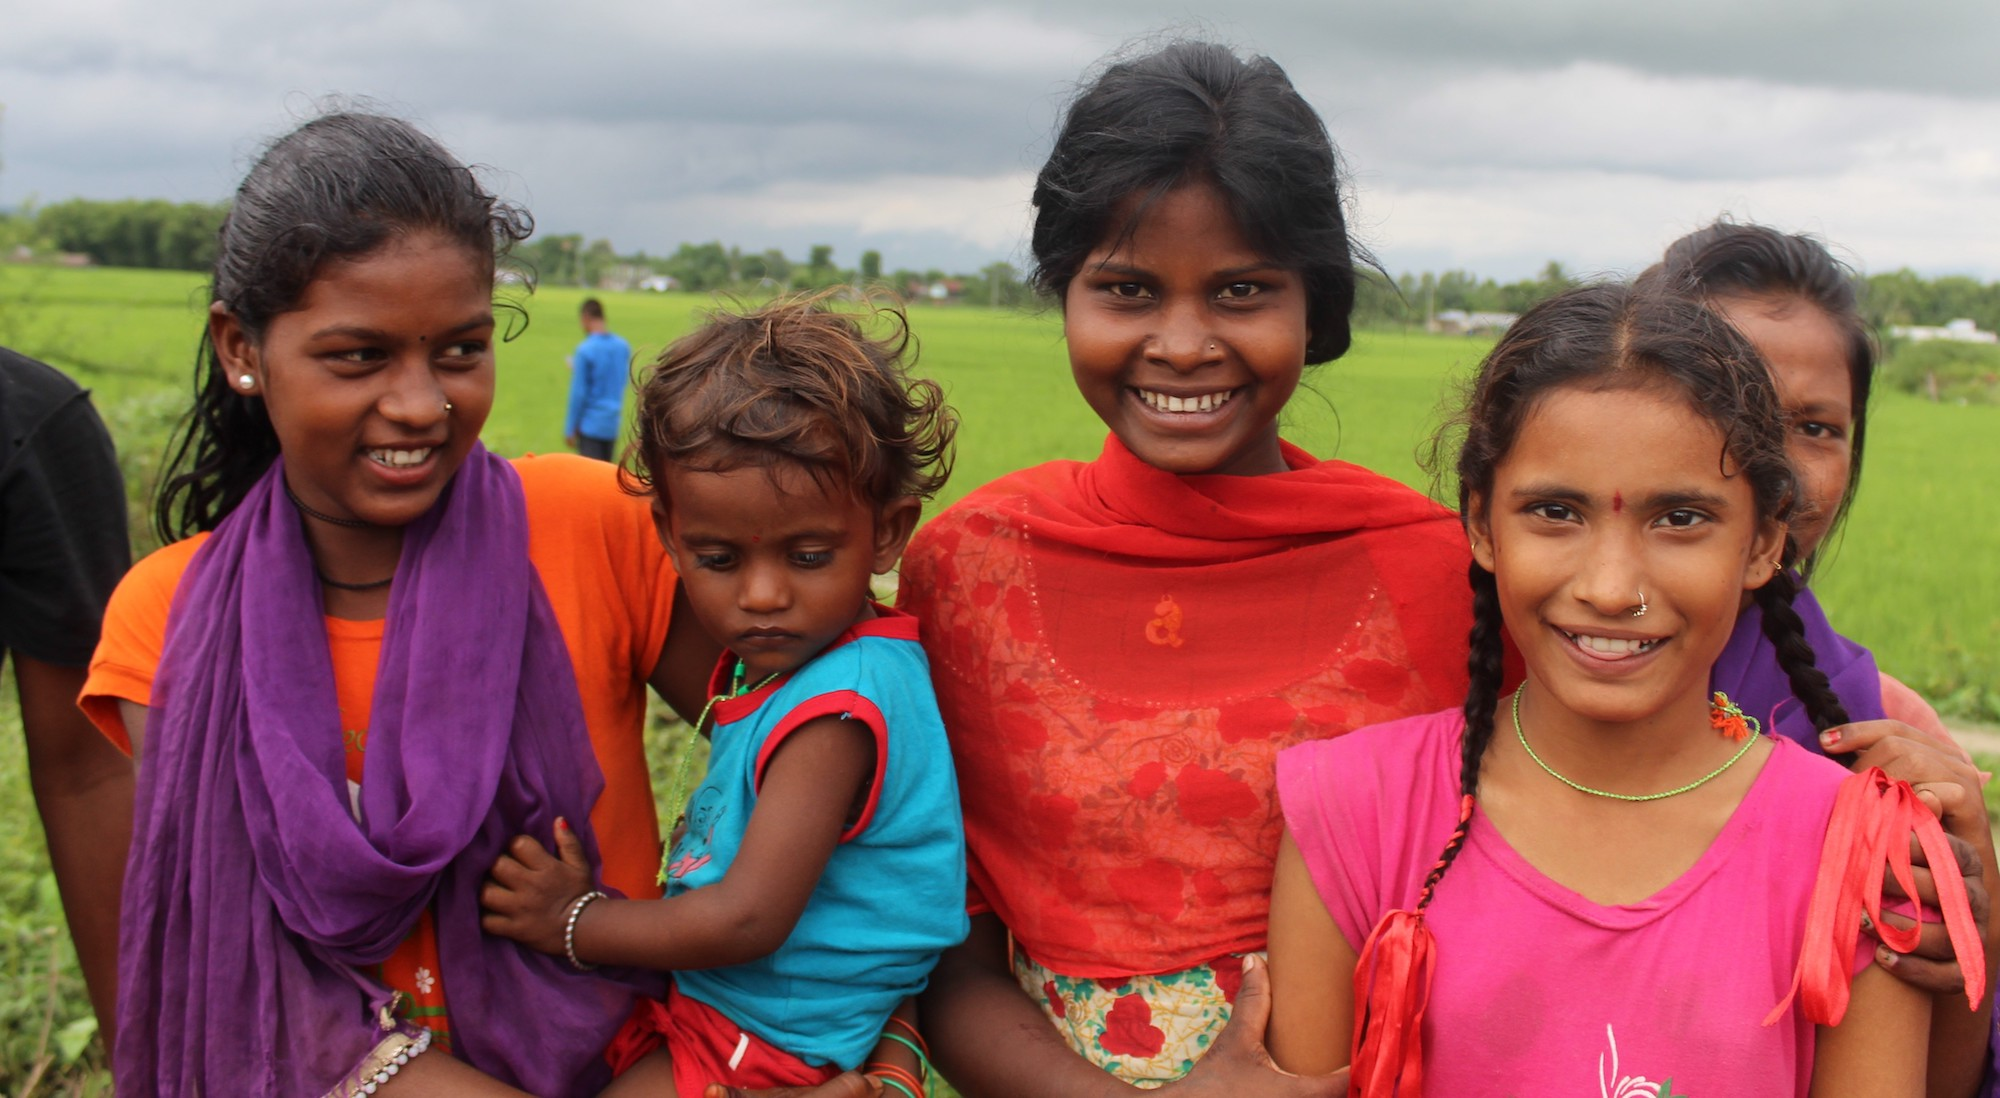 nepal leprosy trust ireland